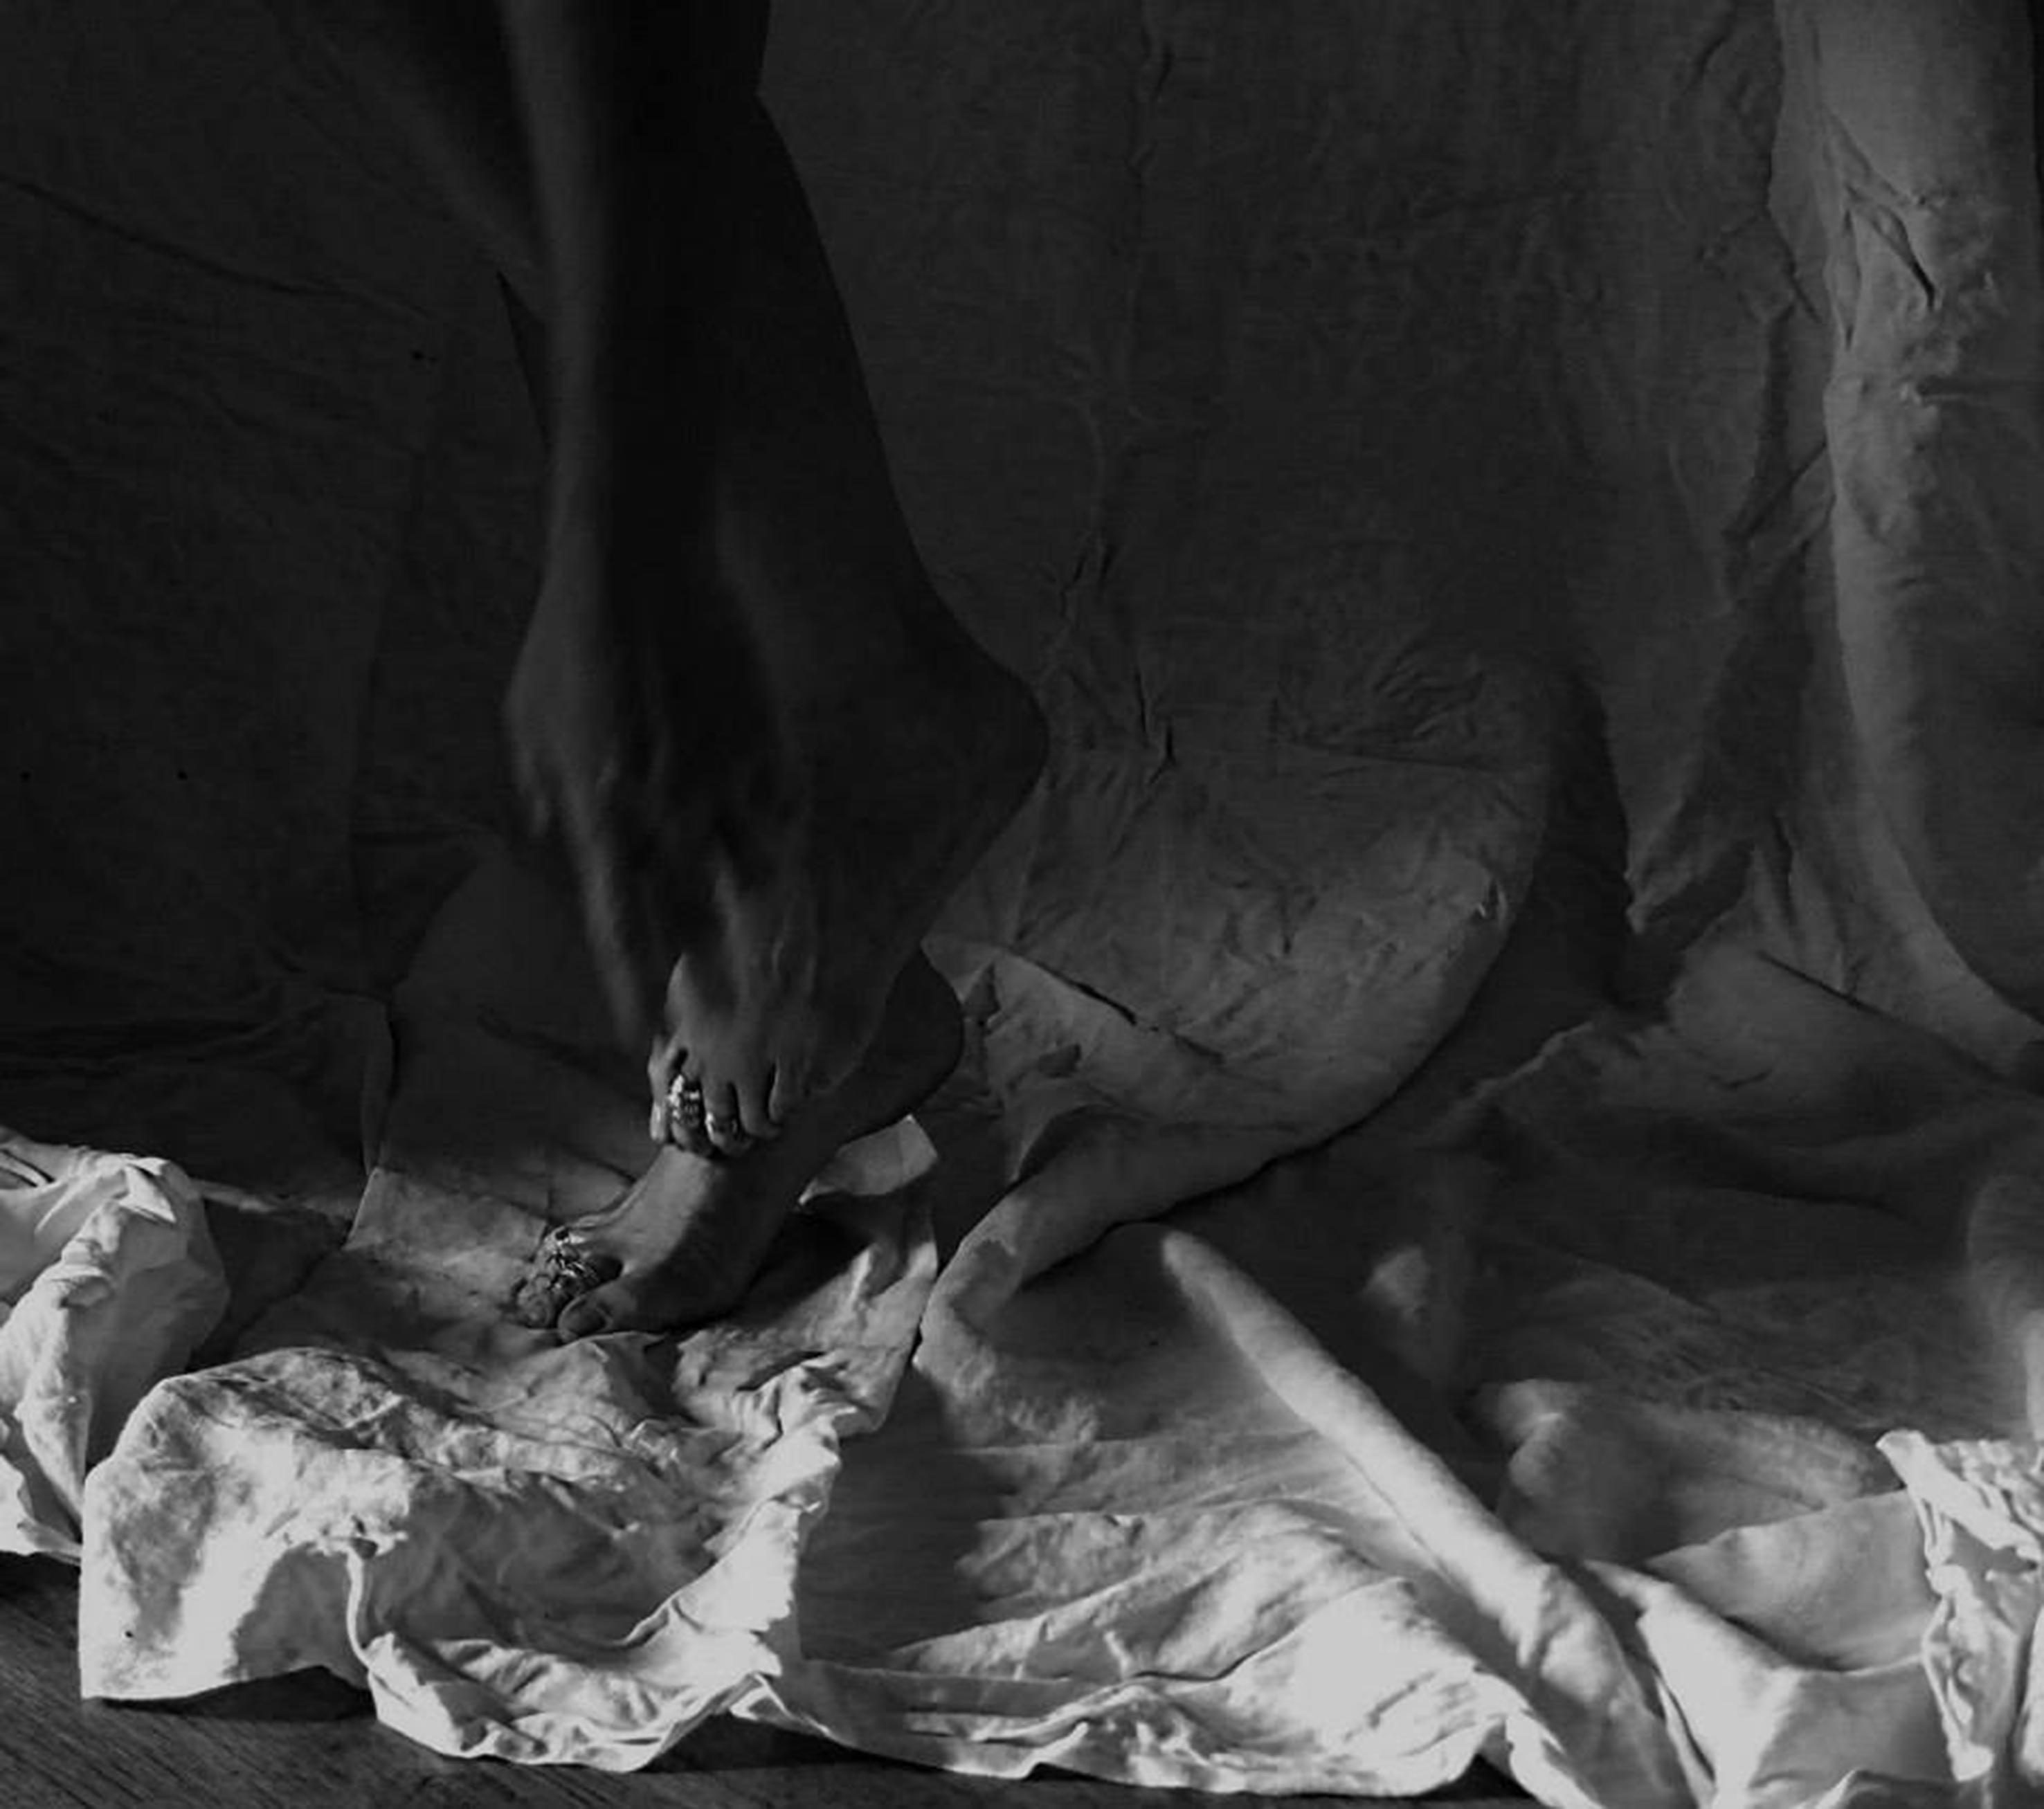 Fotografia di Teresa Imbriani